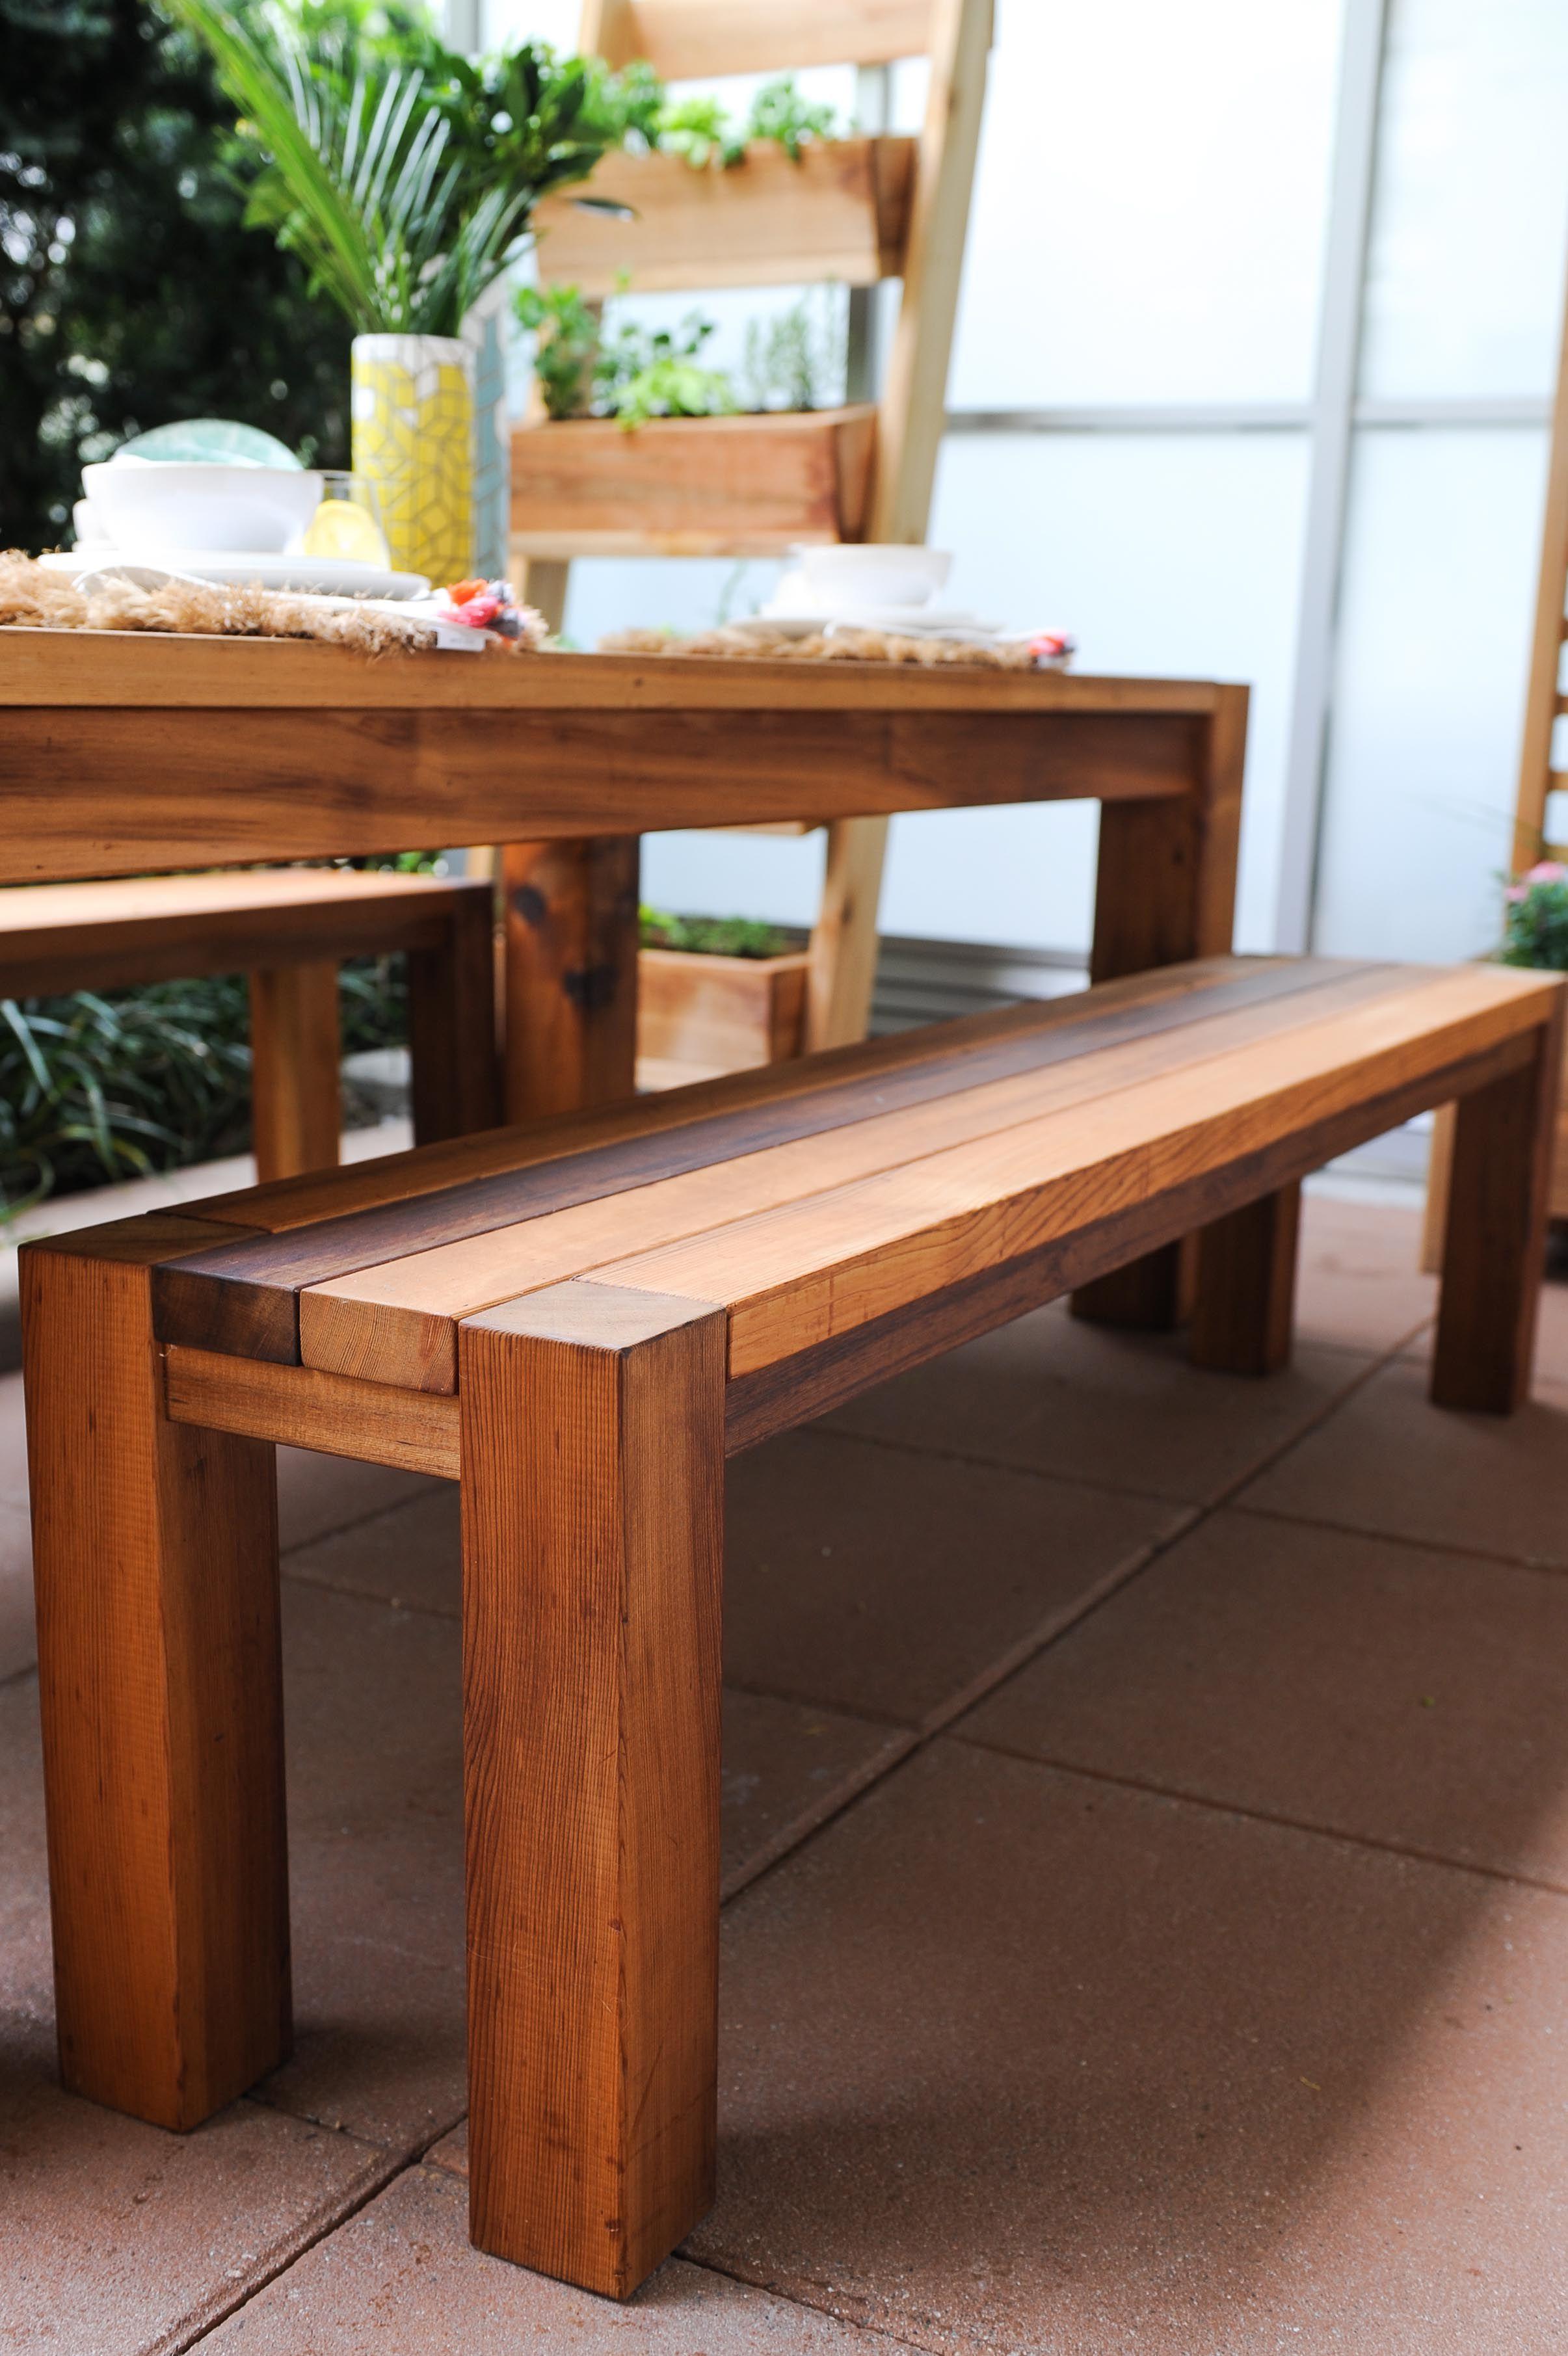 Western red cedar table top western red cedar live edge table top - Western Red Cedar Free Project Plans Dining Table